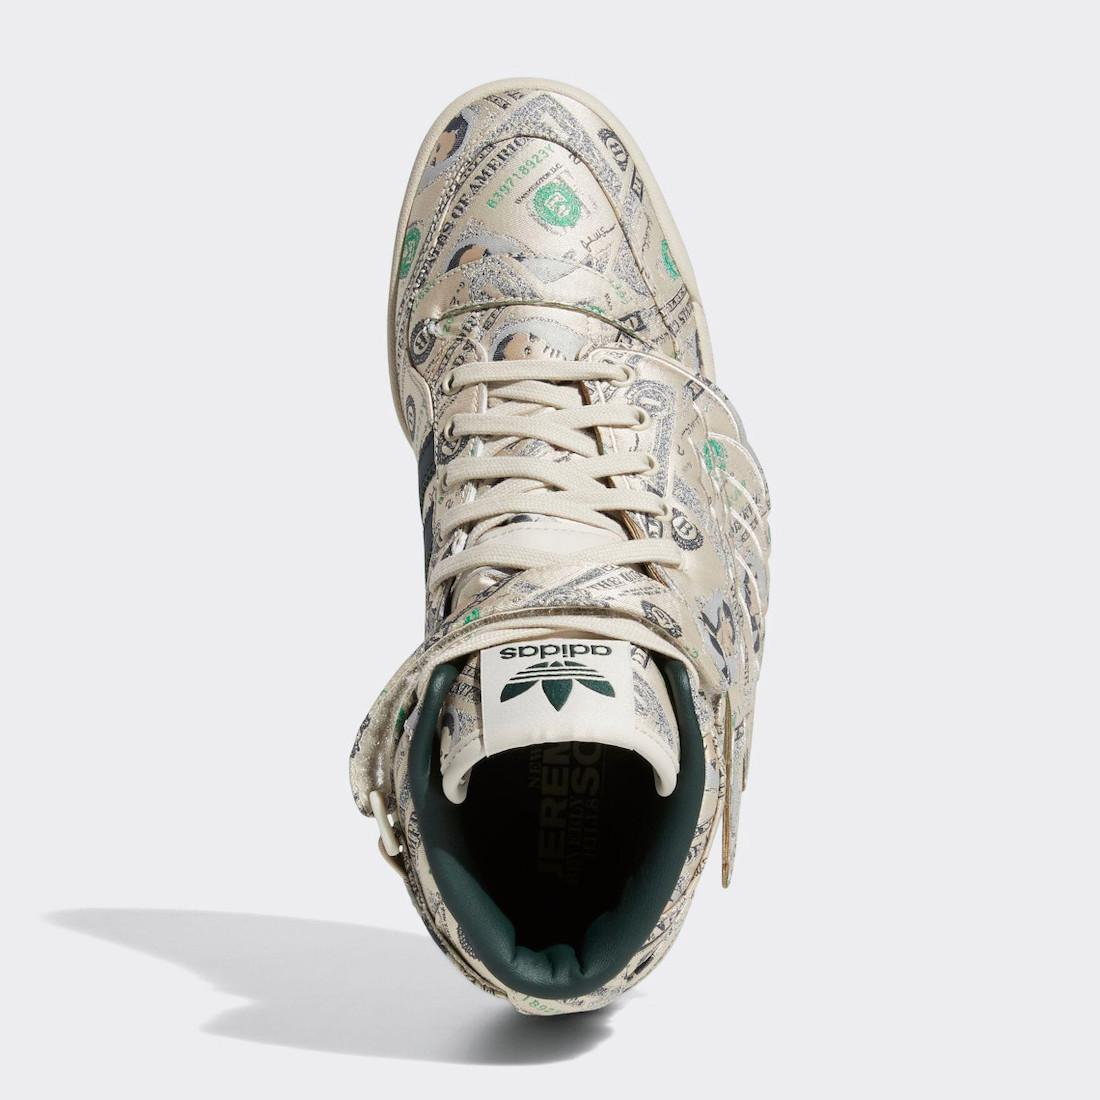 Jeremy Scott,adidas,Forum Wing  adidas Confirmed 开启登记!「Jeremy Scott 翅膀鞋」即将发售!